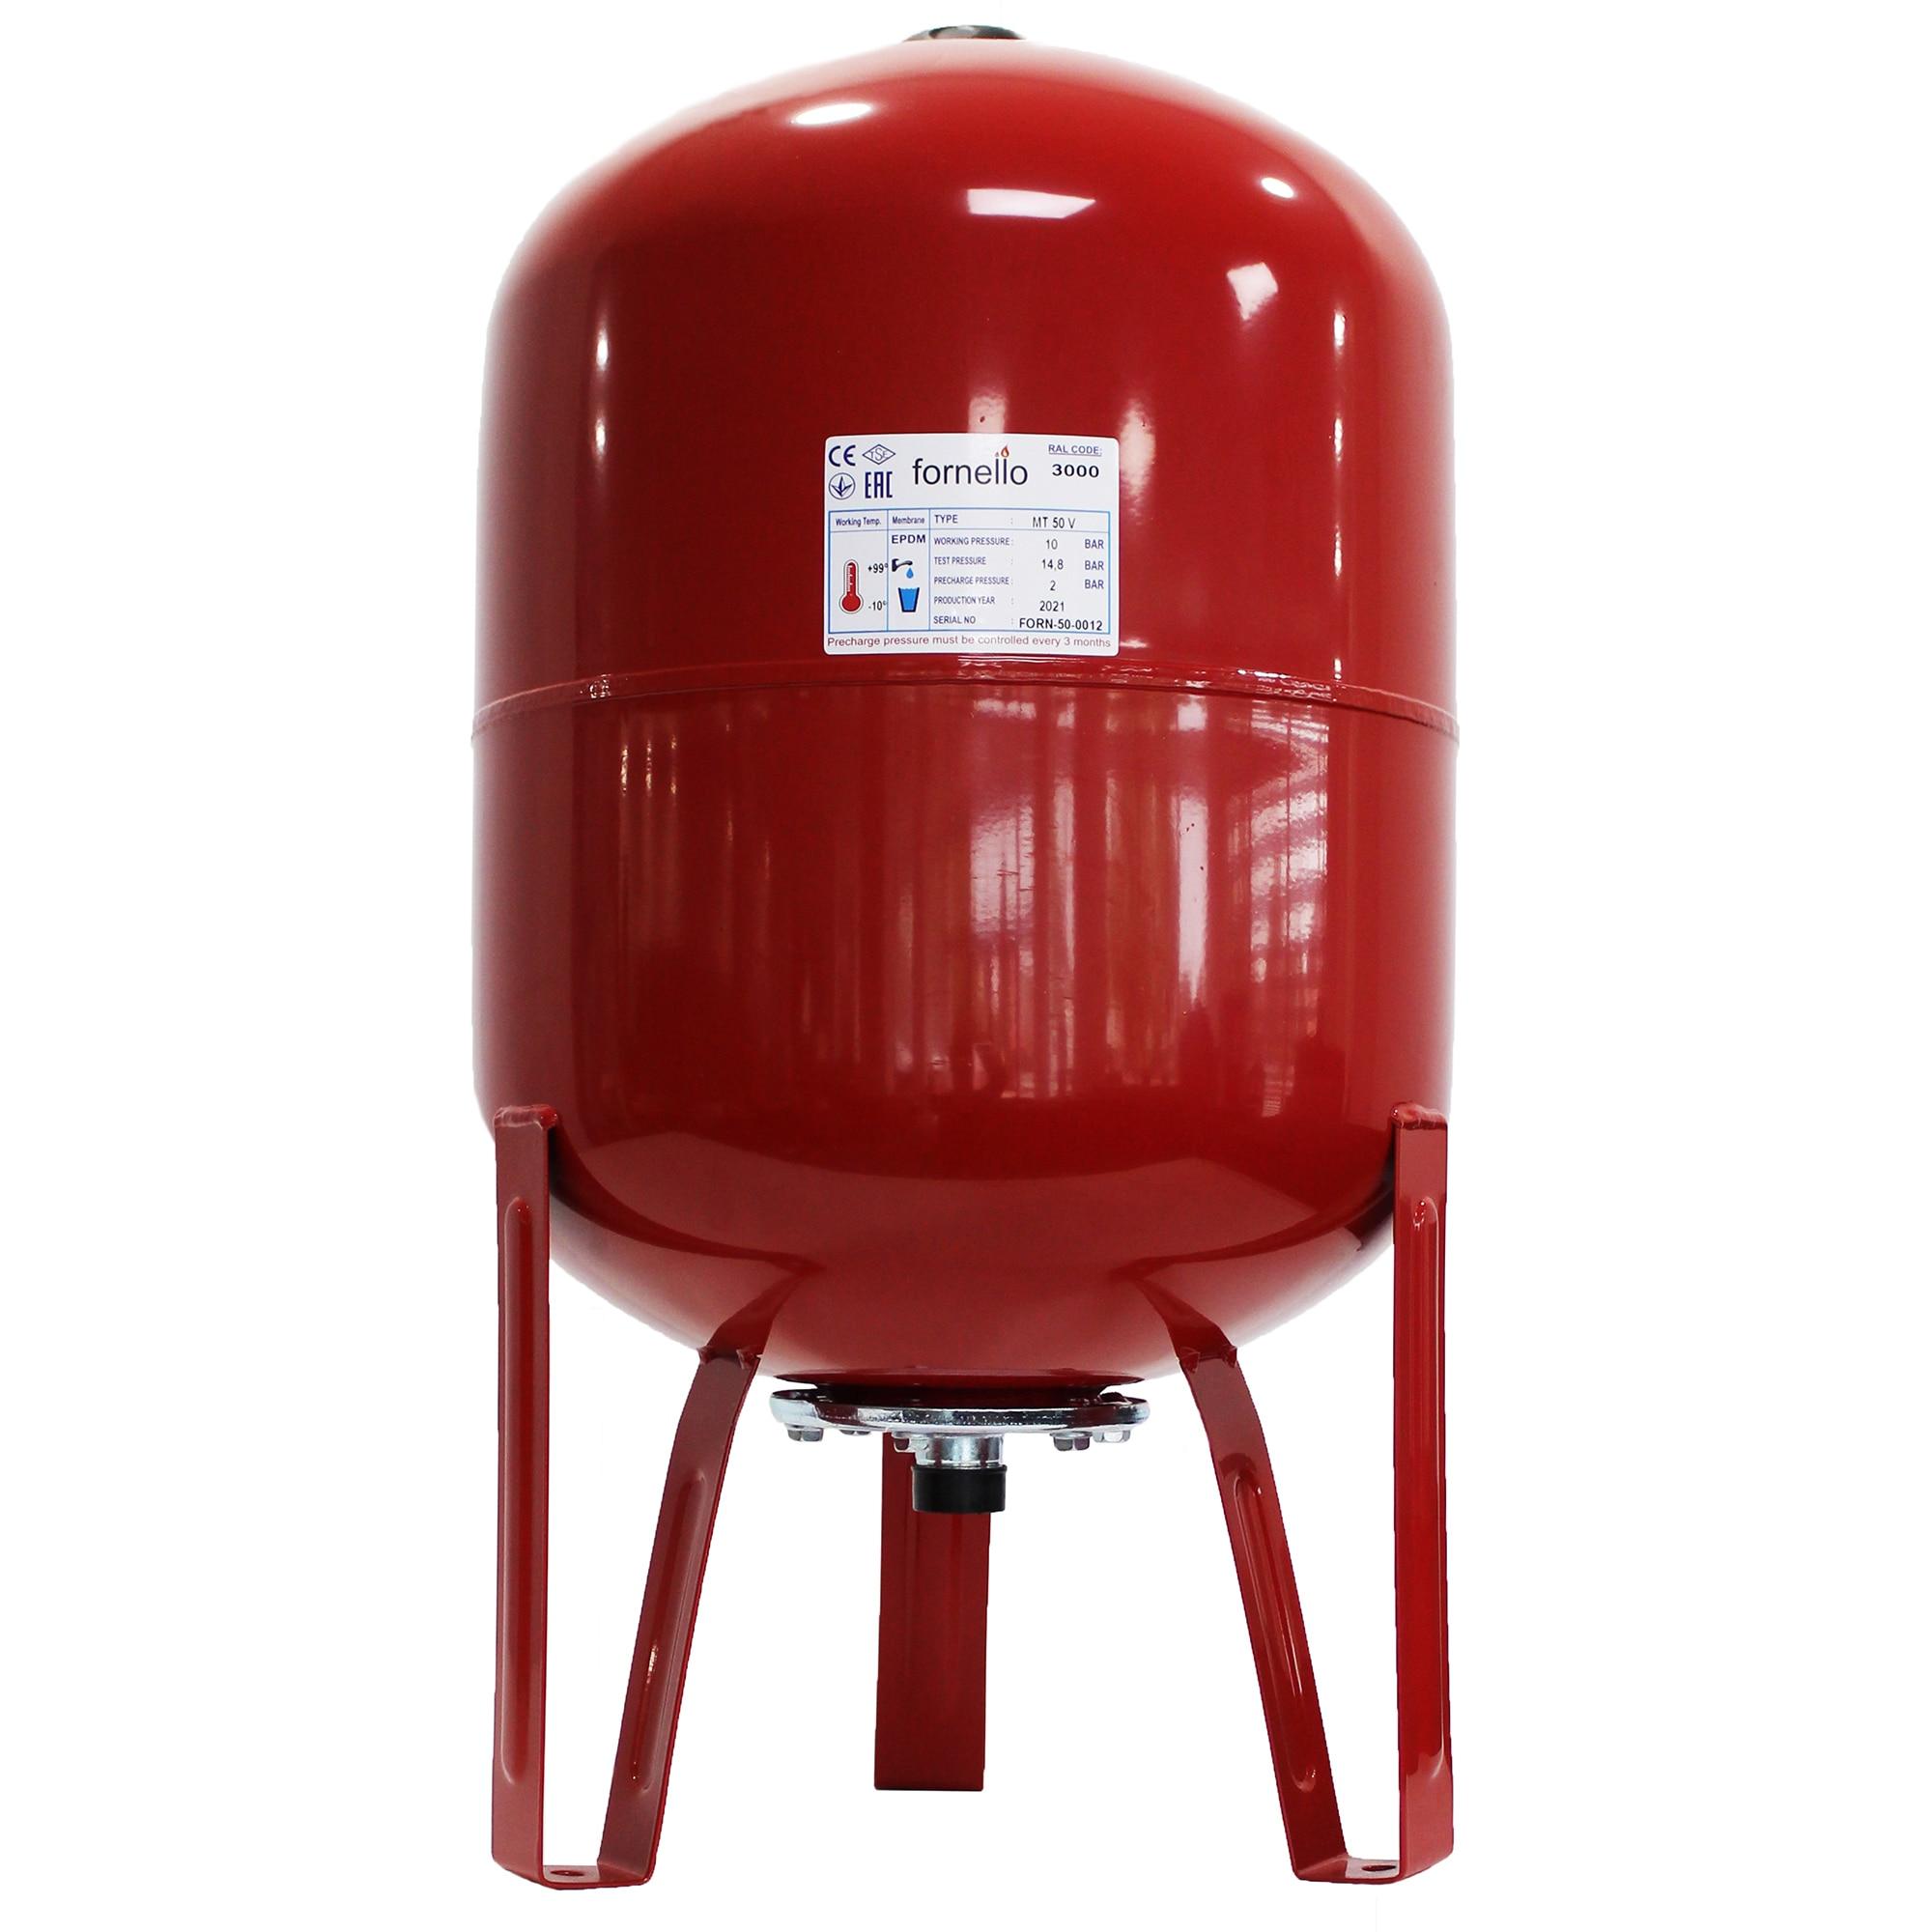 Fotografie Vas expansiune termic Fornello, 50 litri, vertical, cu picioare, culoare rosu, presiune maxima 10 bar, membrana EPDM